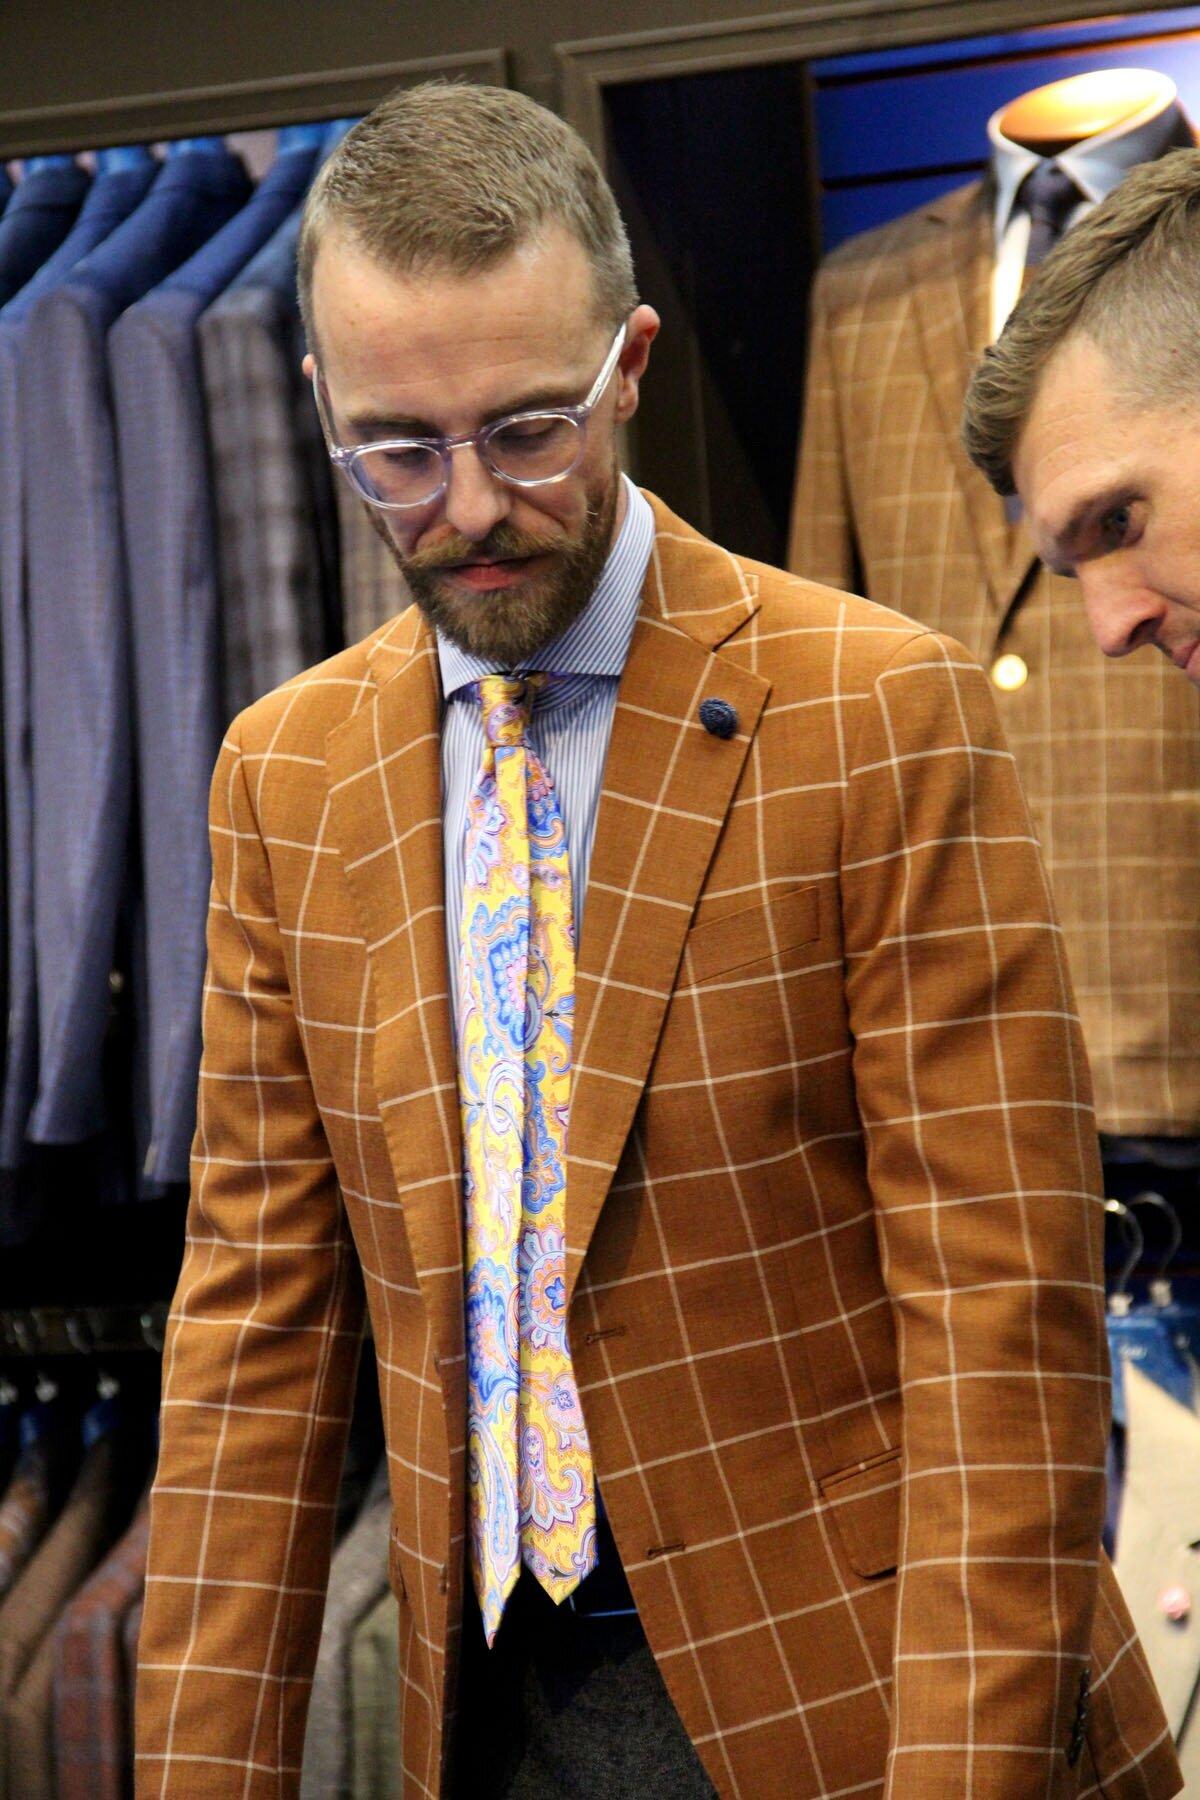 Covona Mens Neck Tie Suit Formal Dress Wear Italian Design Orange Satin Sheen O1